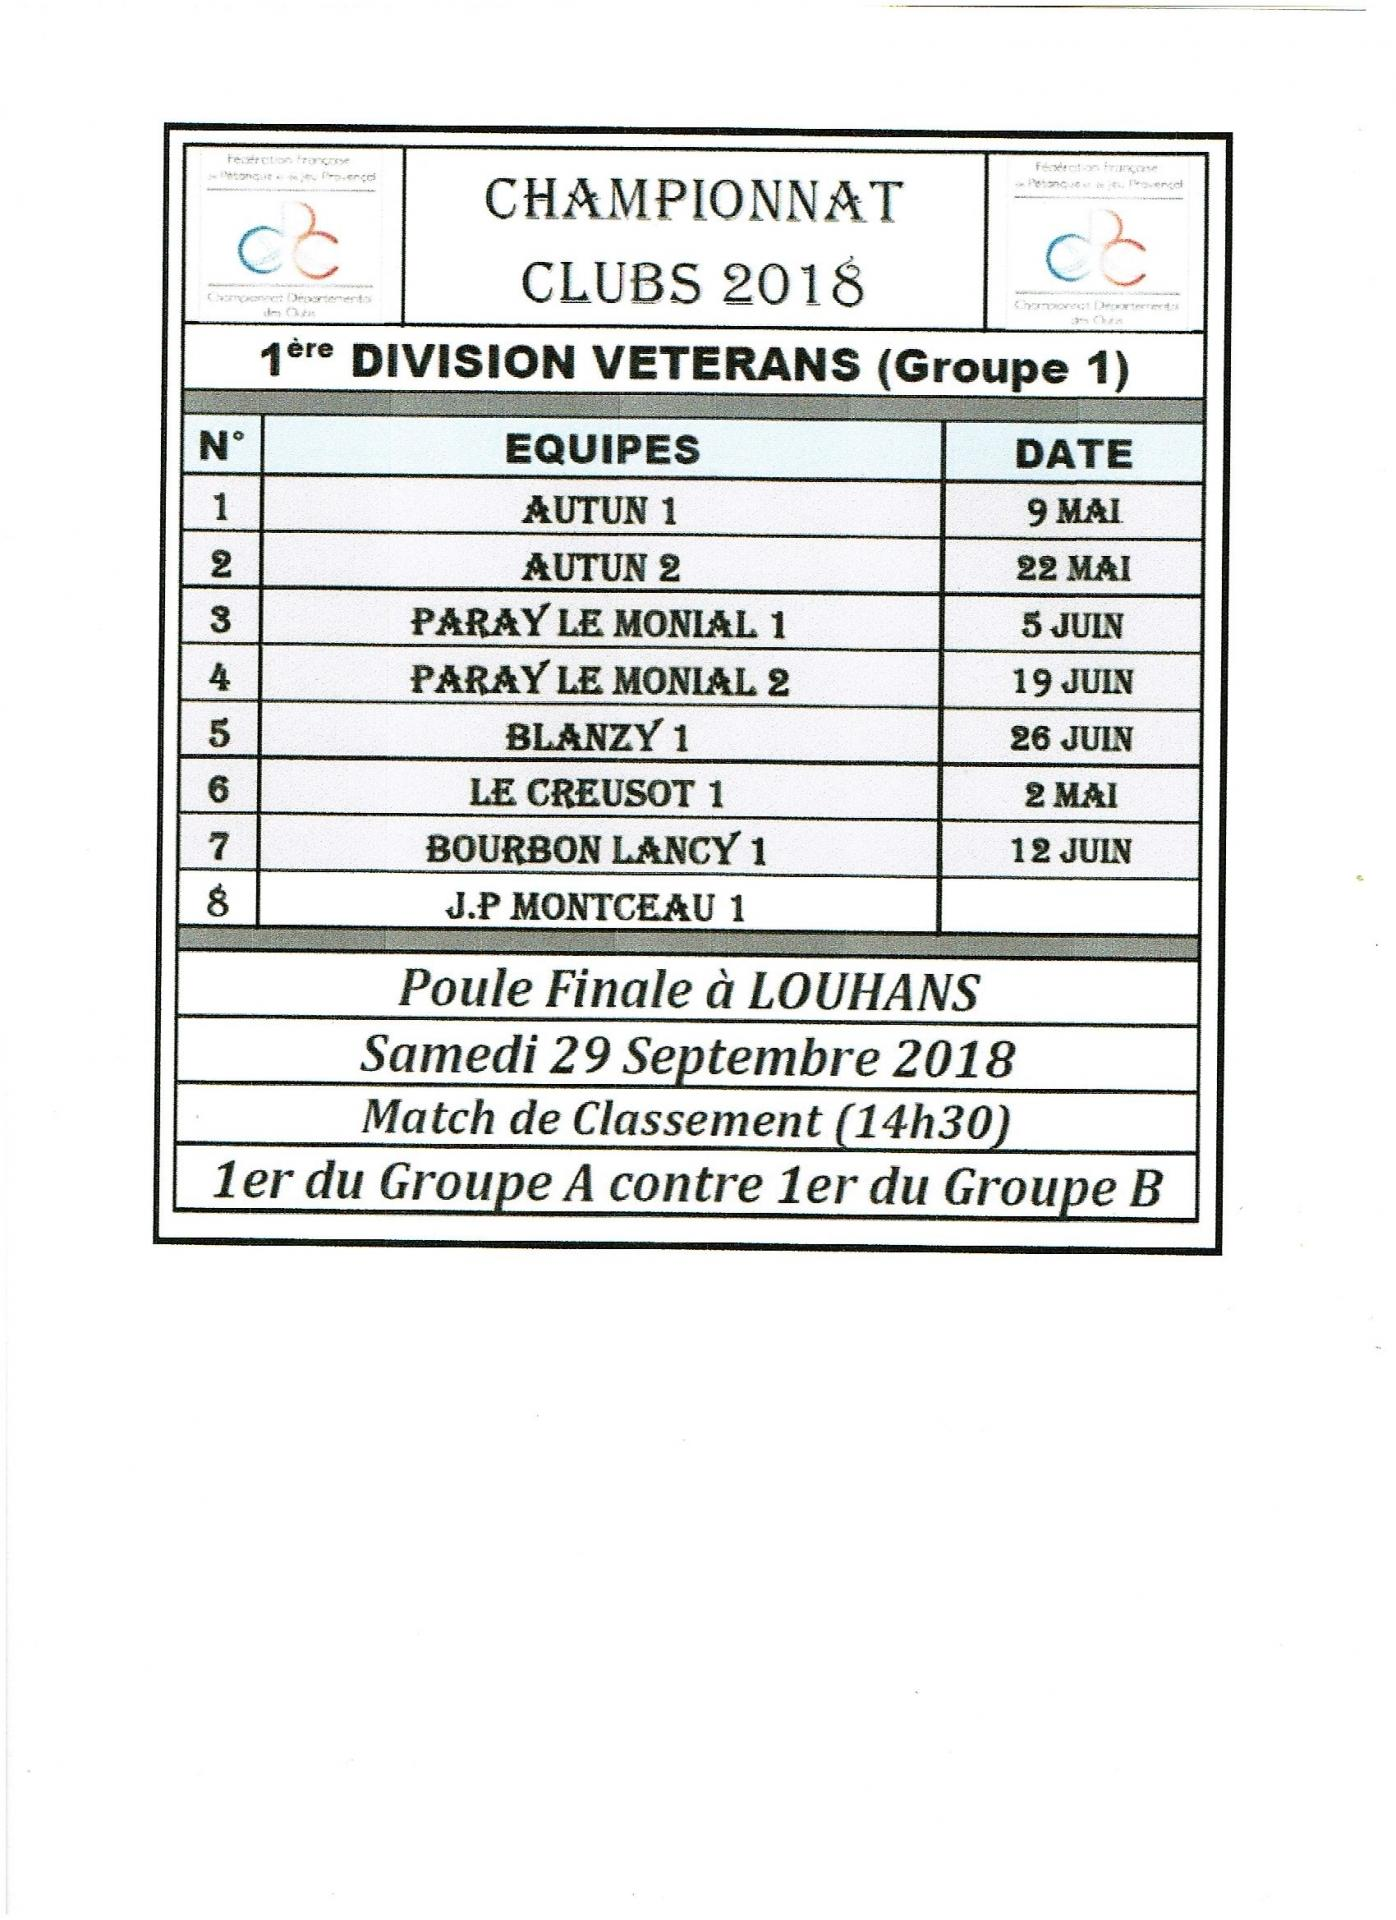 1ere division veterans g1